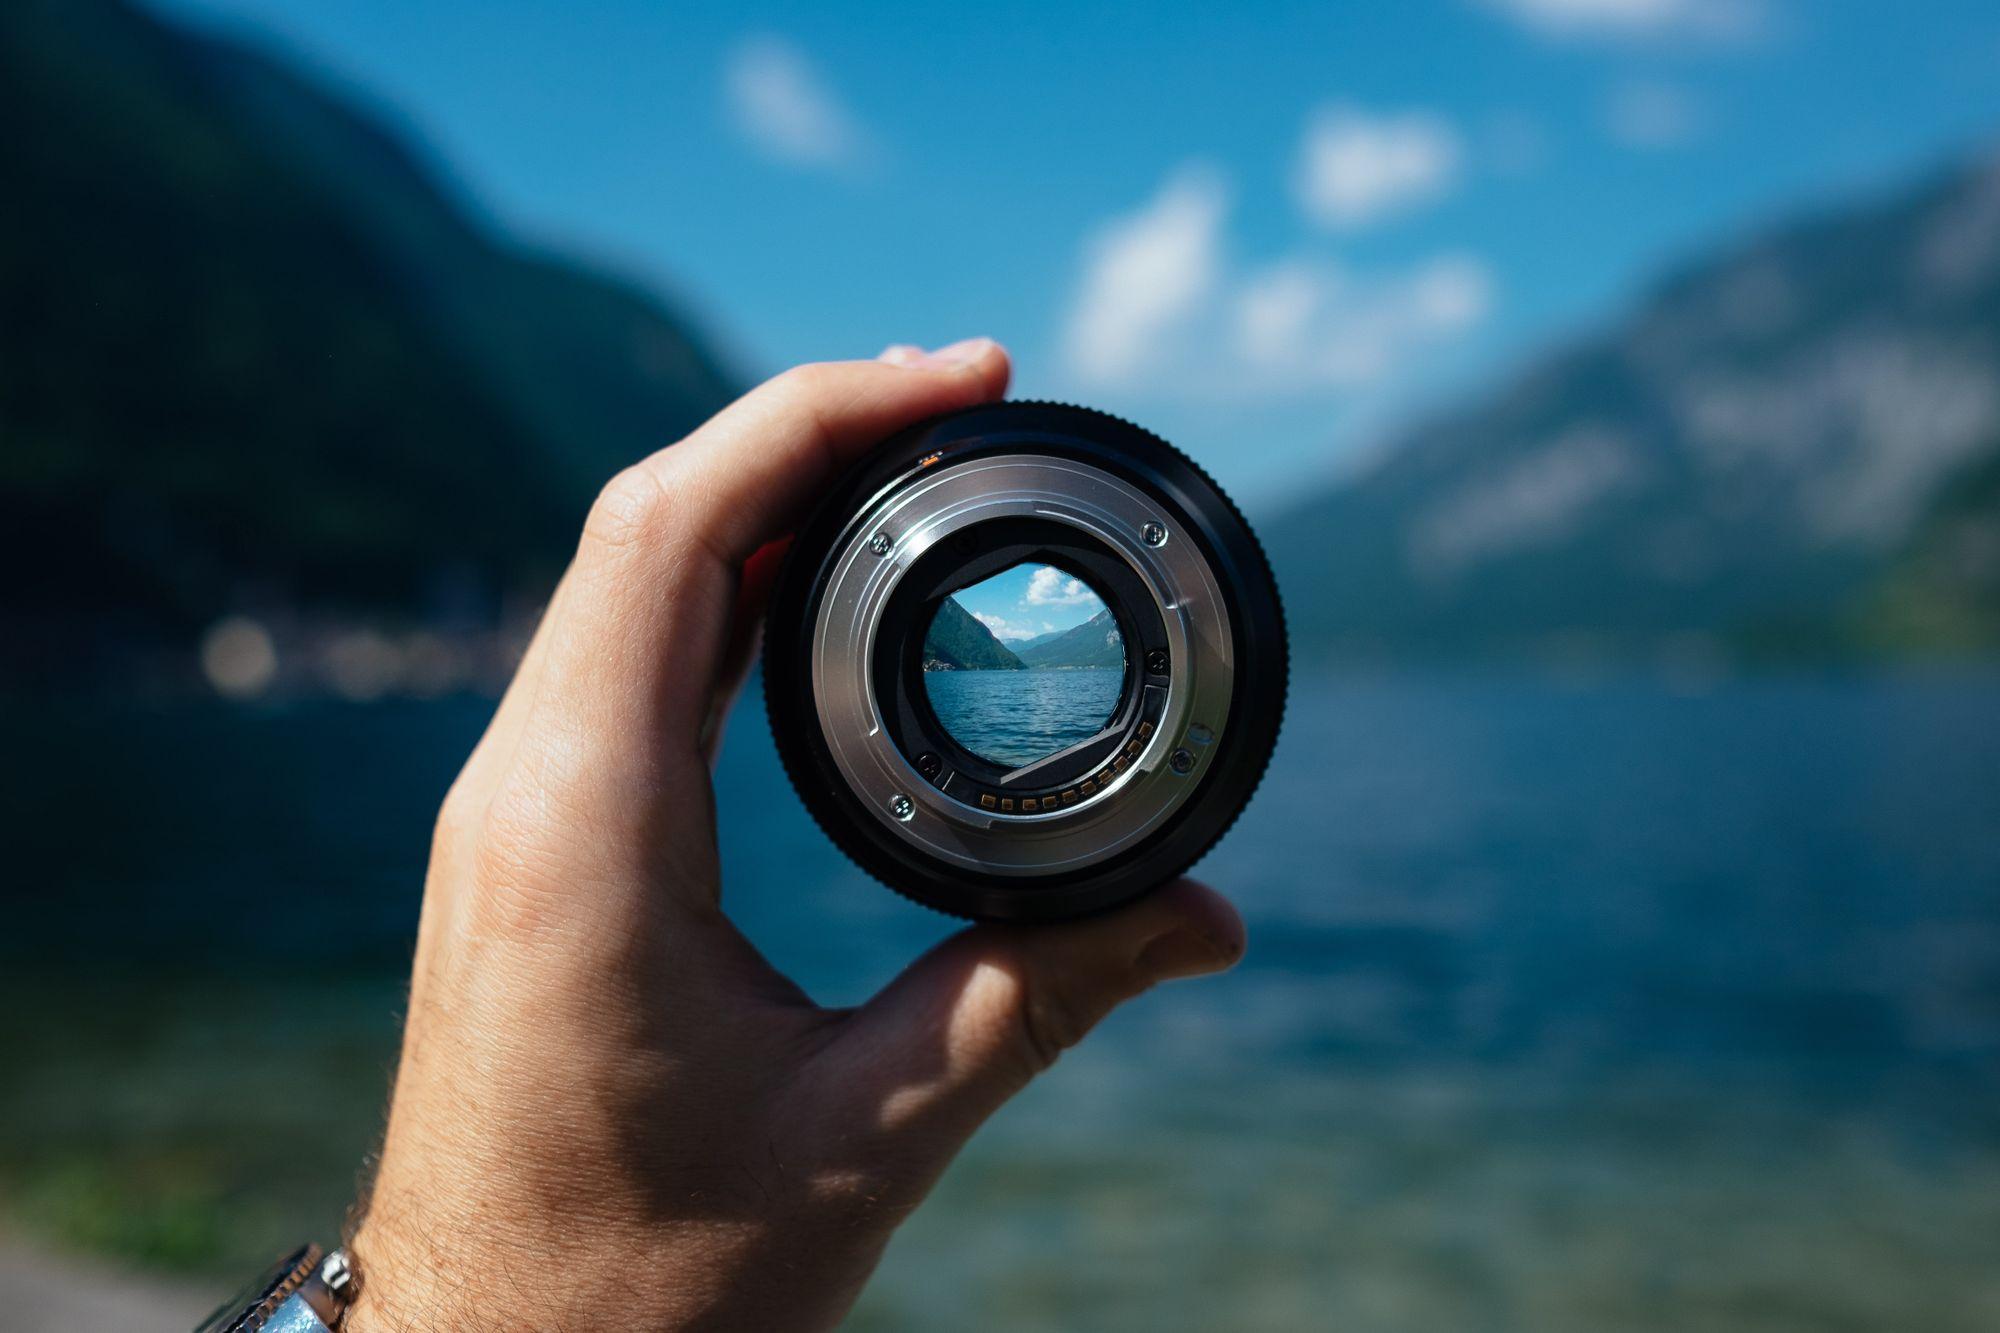 Camera focus in cinematography